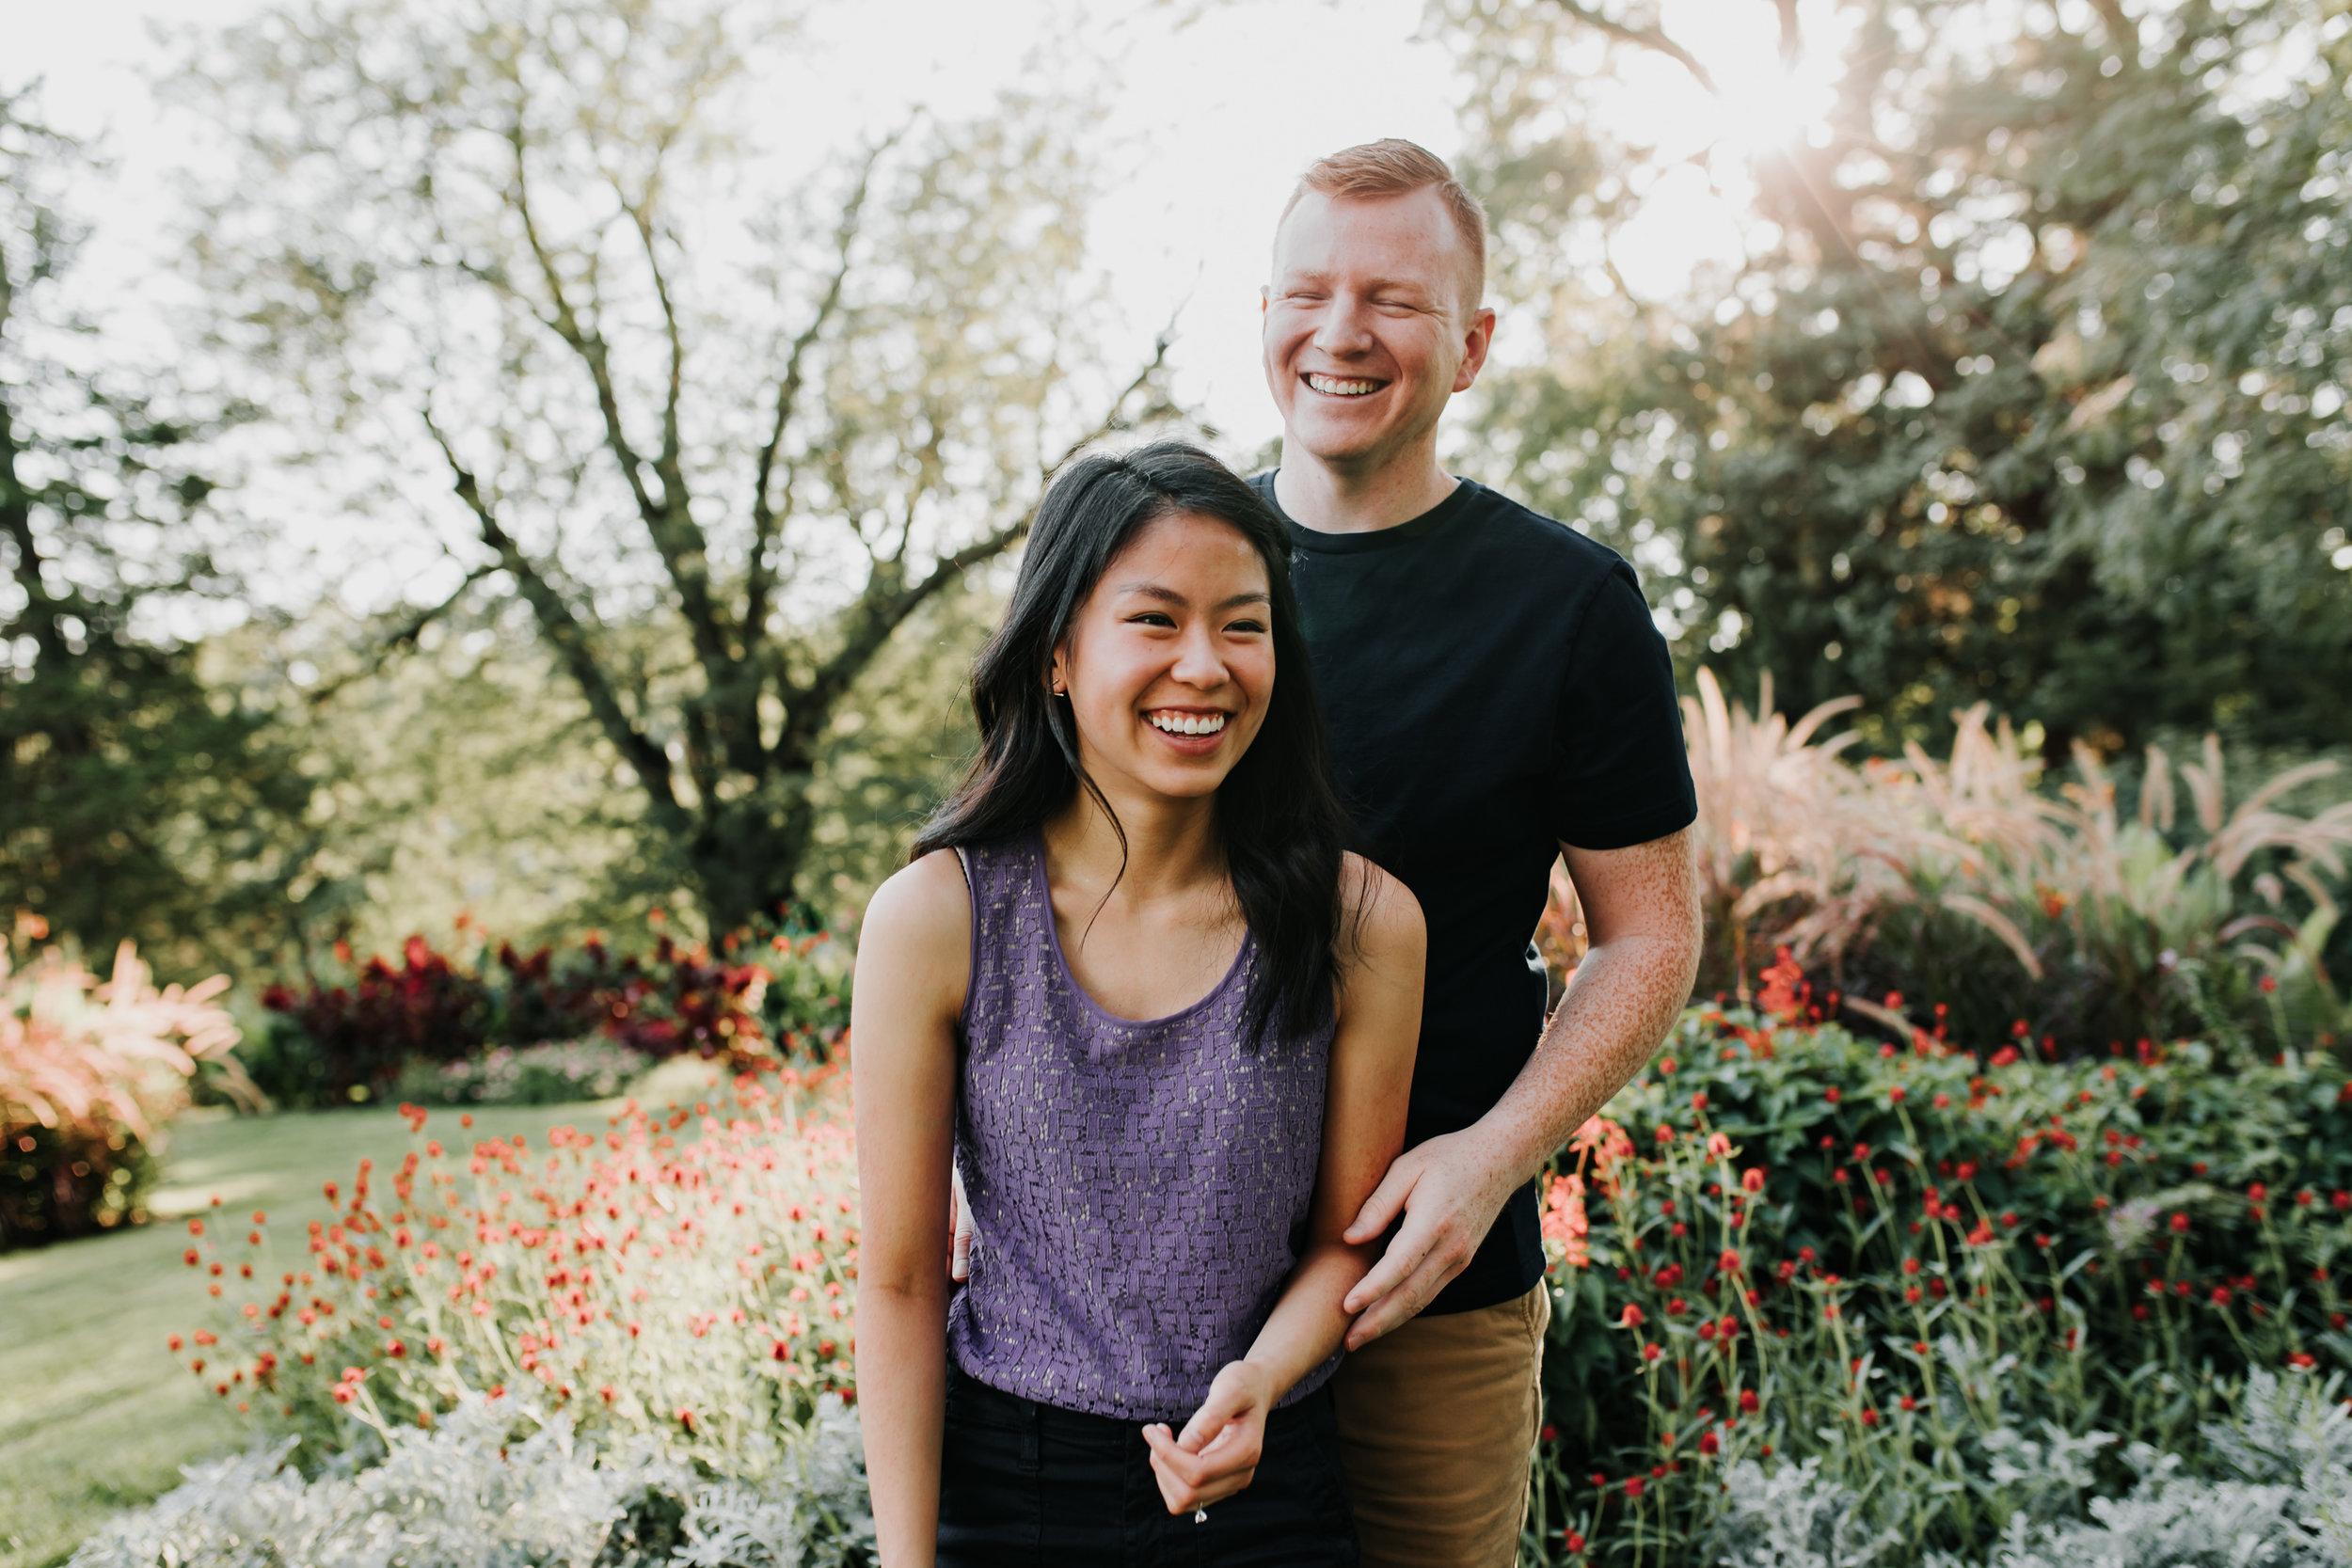 Catherin & Kyle - Married - Nathaniel Jensen Photography - Omaha Nebraska Wedding Photograper - Memorial Park - Joslyn Castle Engagement Session-24.jpg